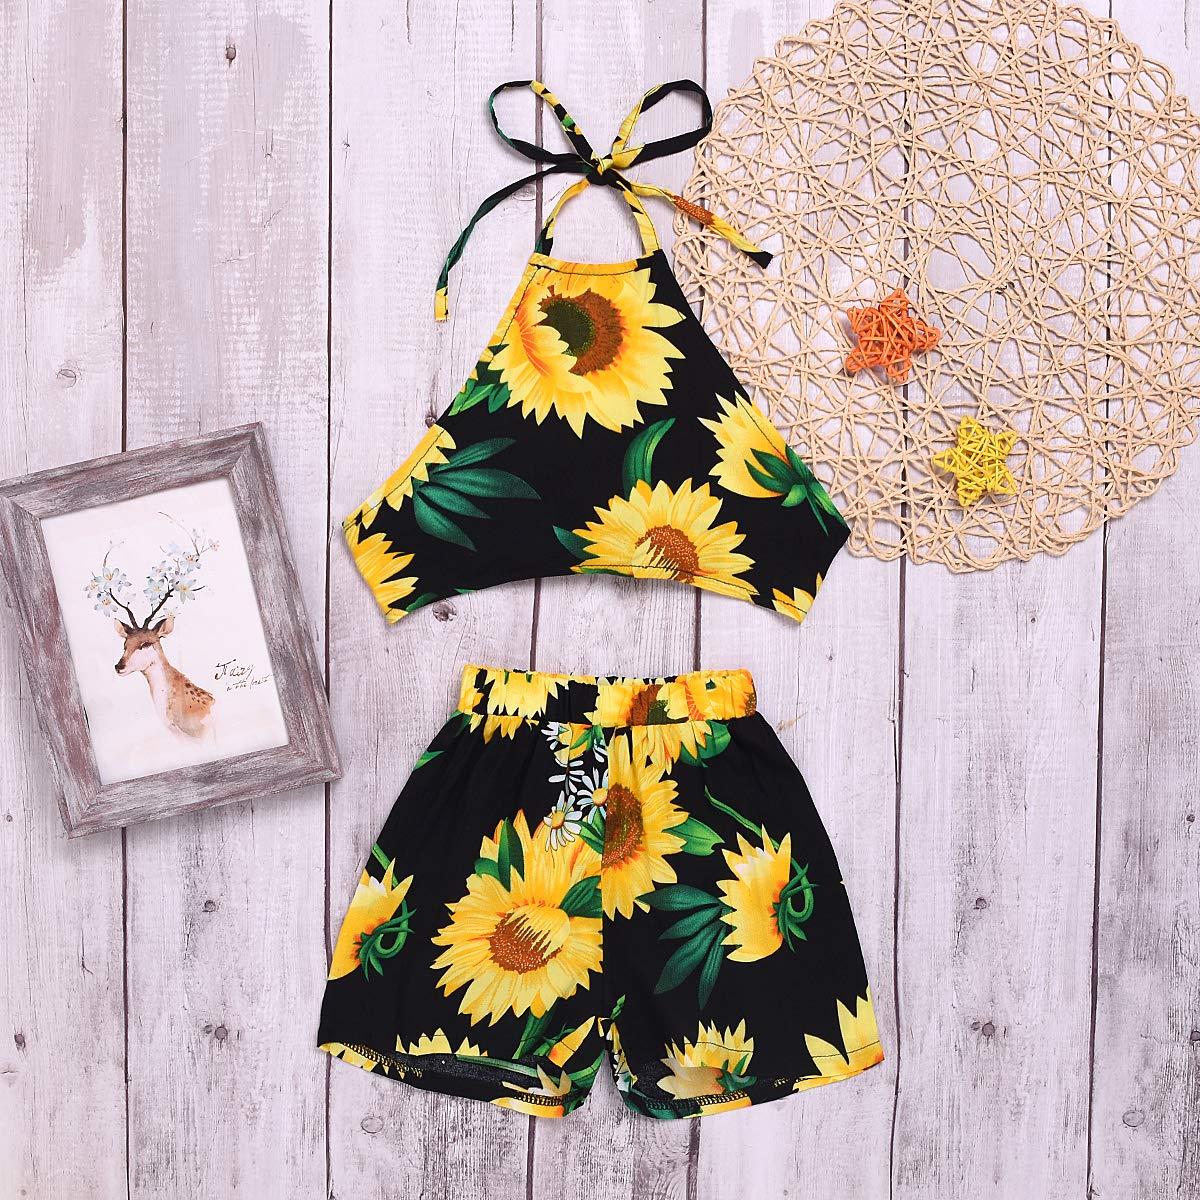 b84829aba0 Amazon.com: YOUNGER TREE Kids Toddler Baby Girls Shorts Set Sunflower  Backless Shirts+ Shorts Beachwear Sunsuit Summer Clothes Outfits: Clothing